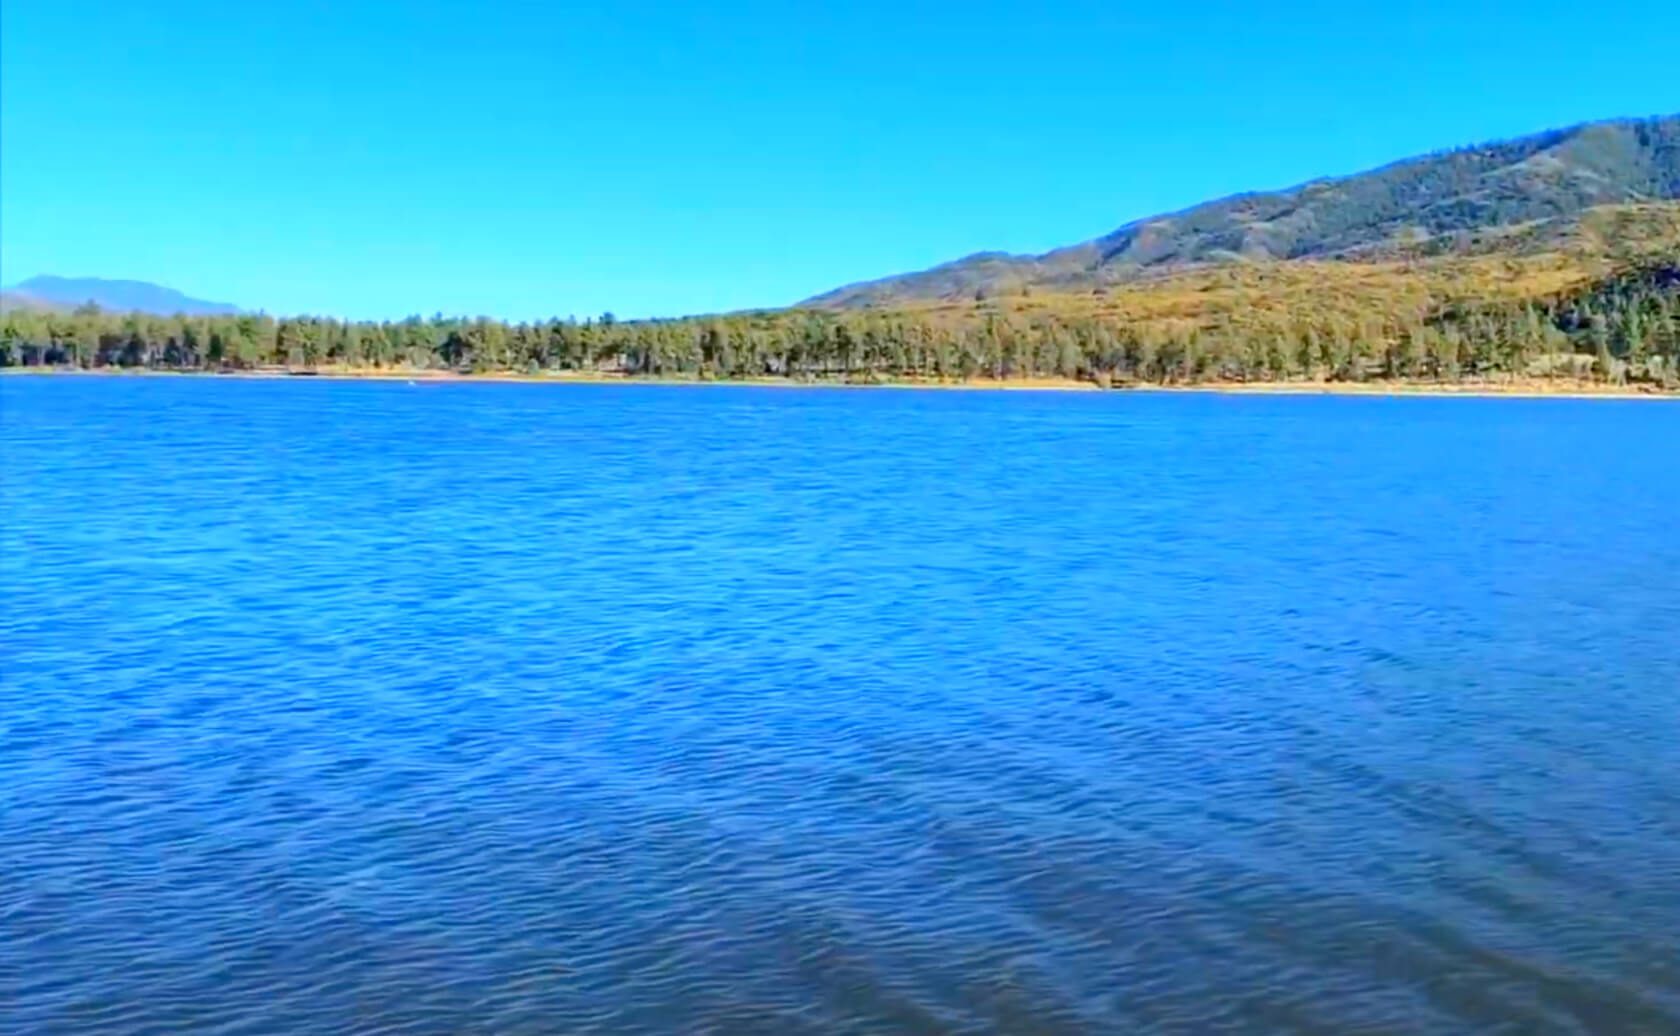 Hemet-Lake-Fishing-Guide-Report-Idyllwild-CA-02